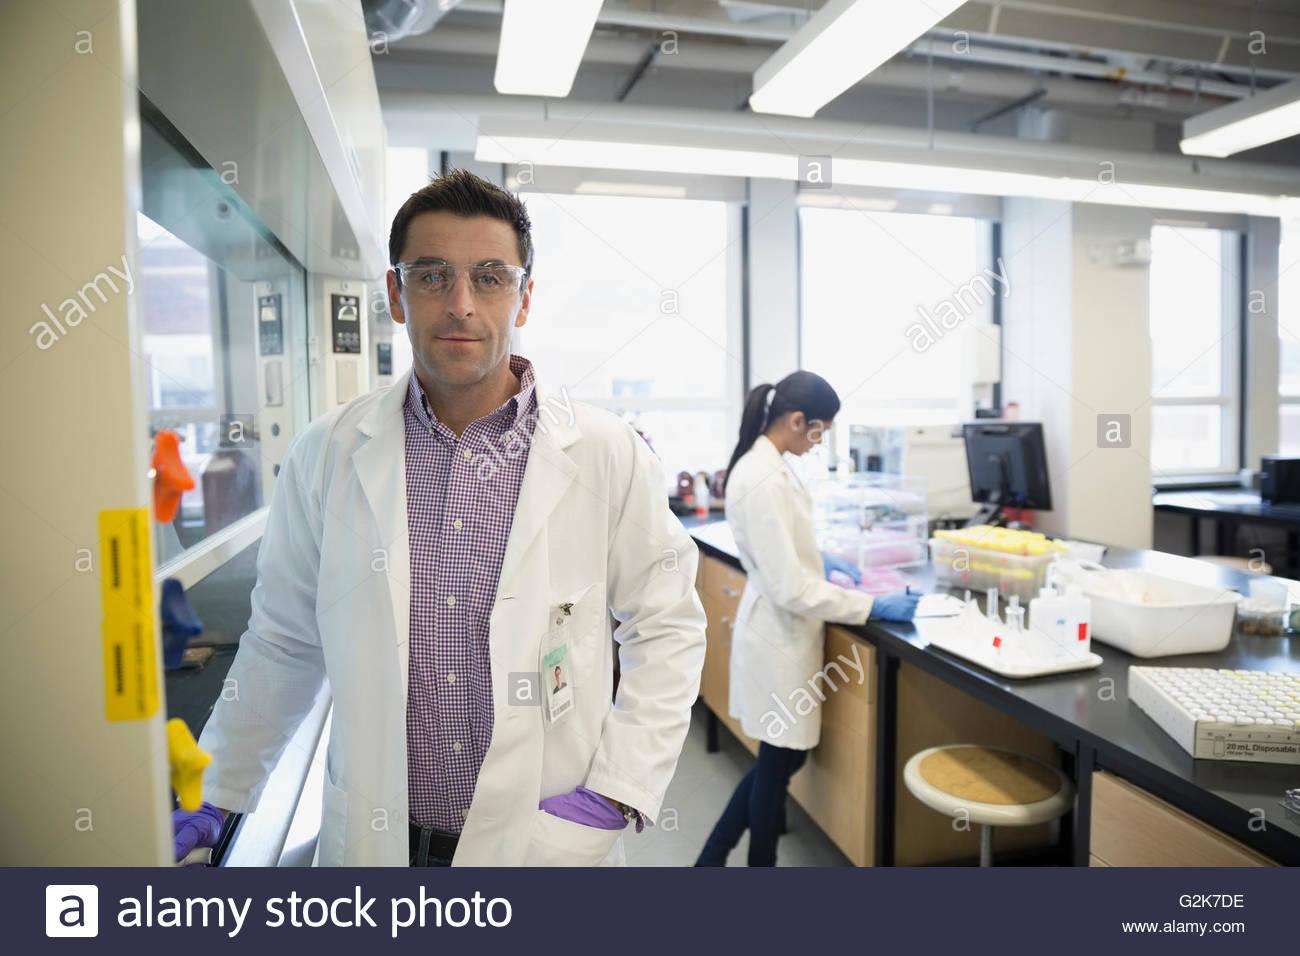 Portrait confident scientist at fume hood in laboratory - Stock Image